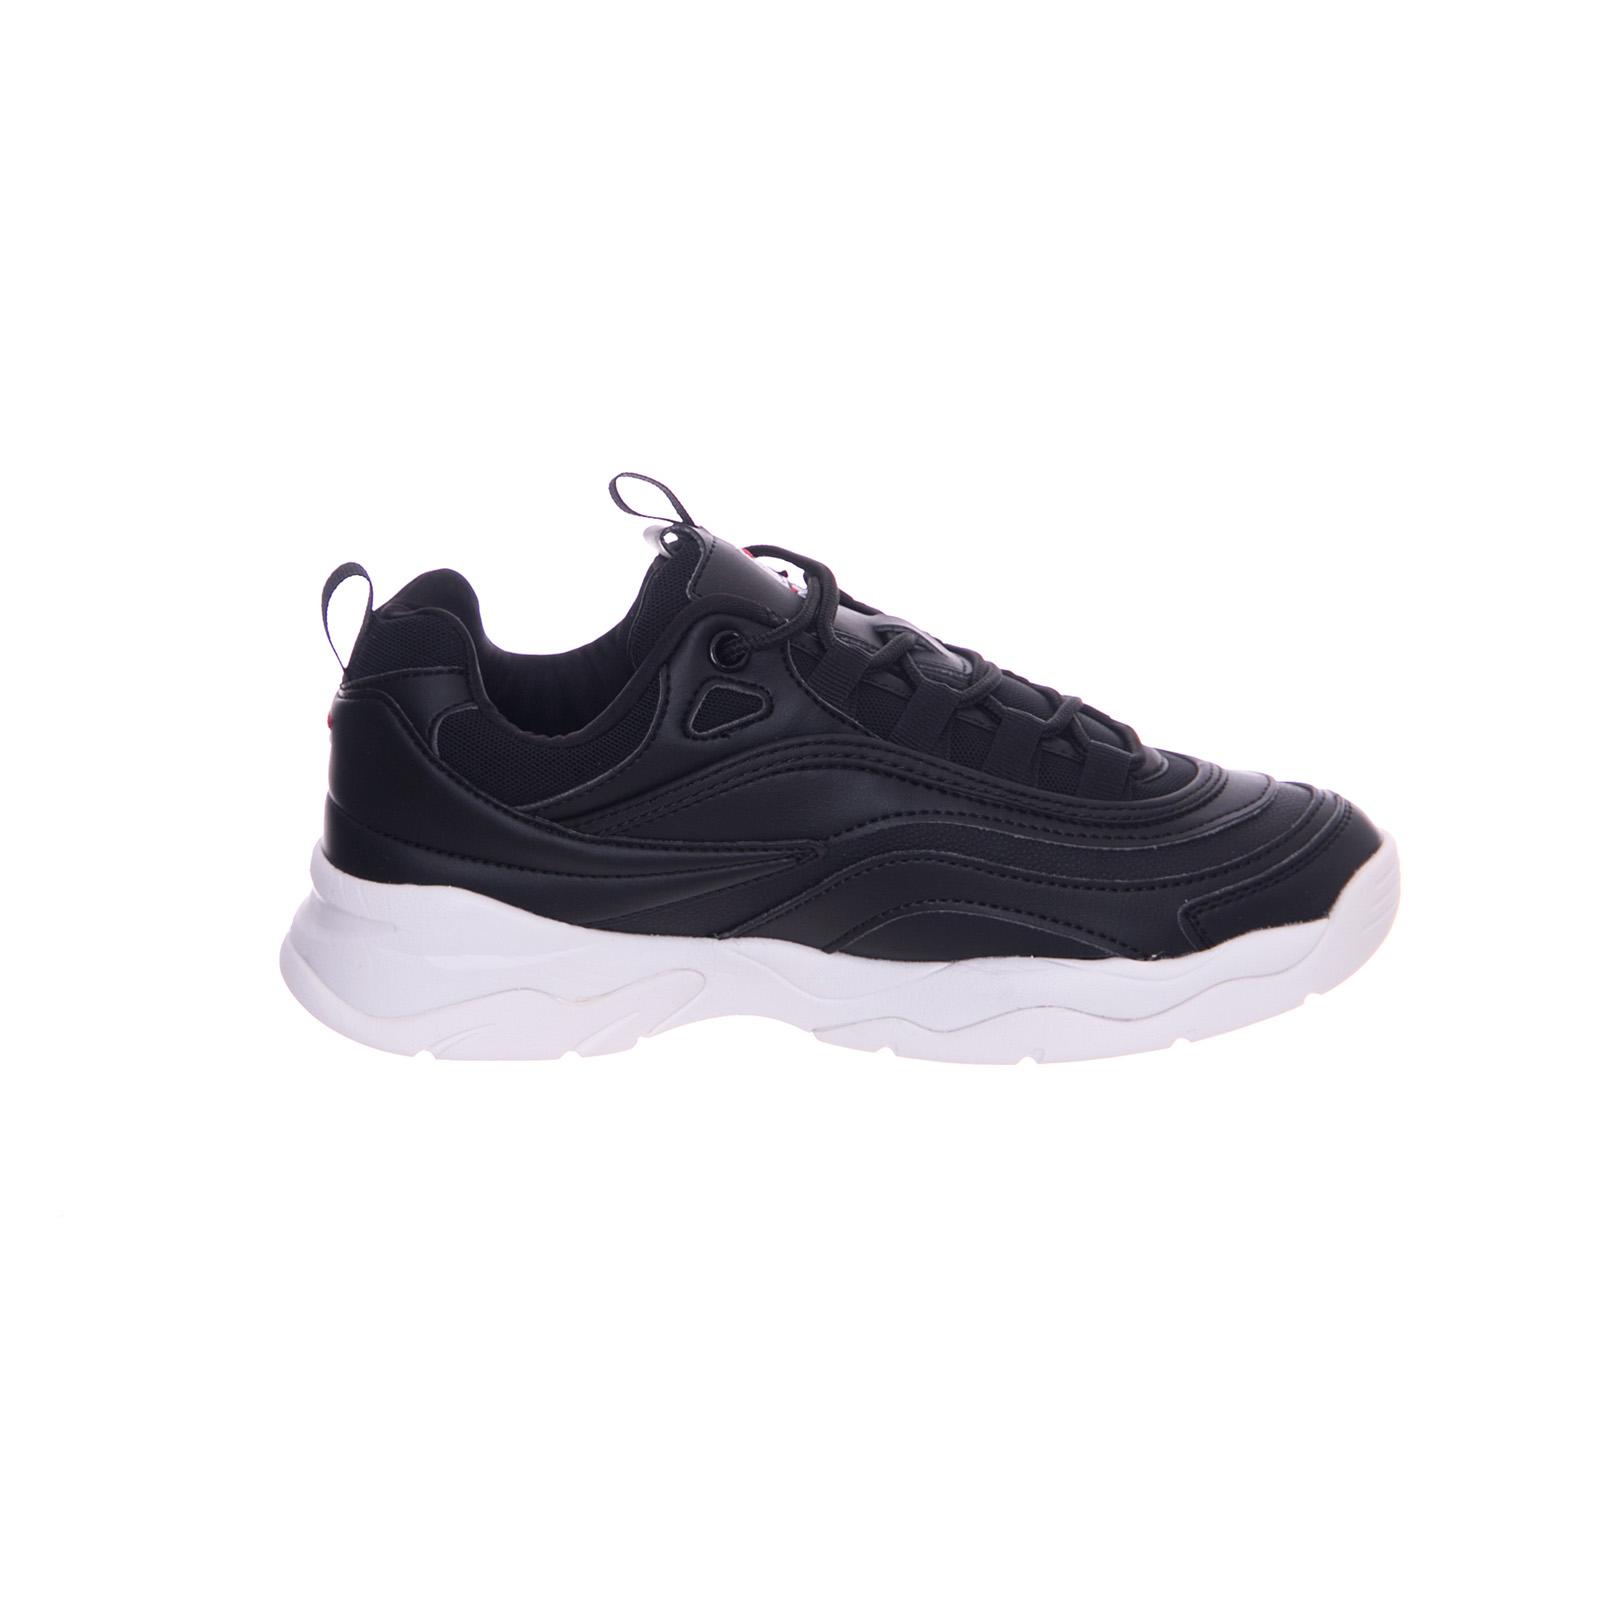 Low Ray Nero Black Fila Sneakers ETxSwnCqSg